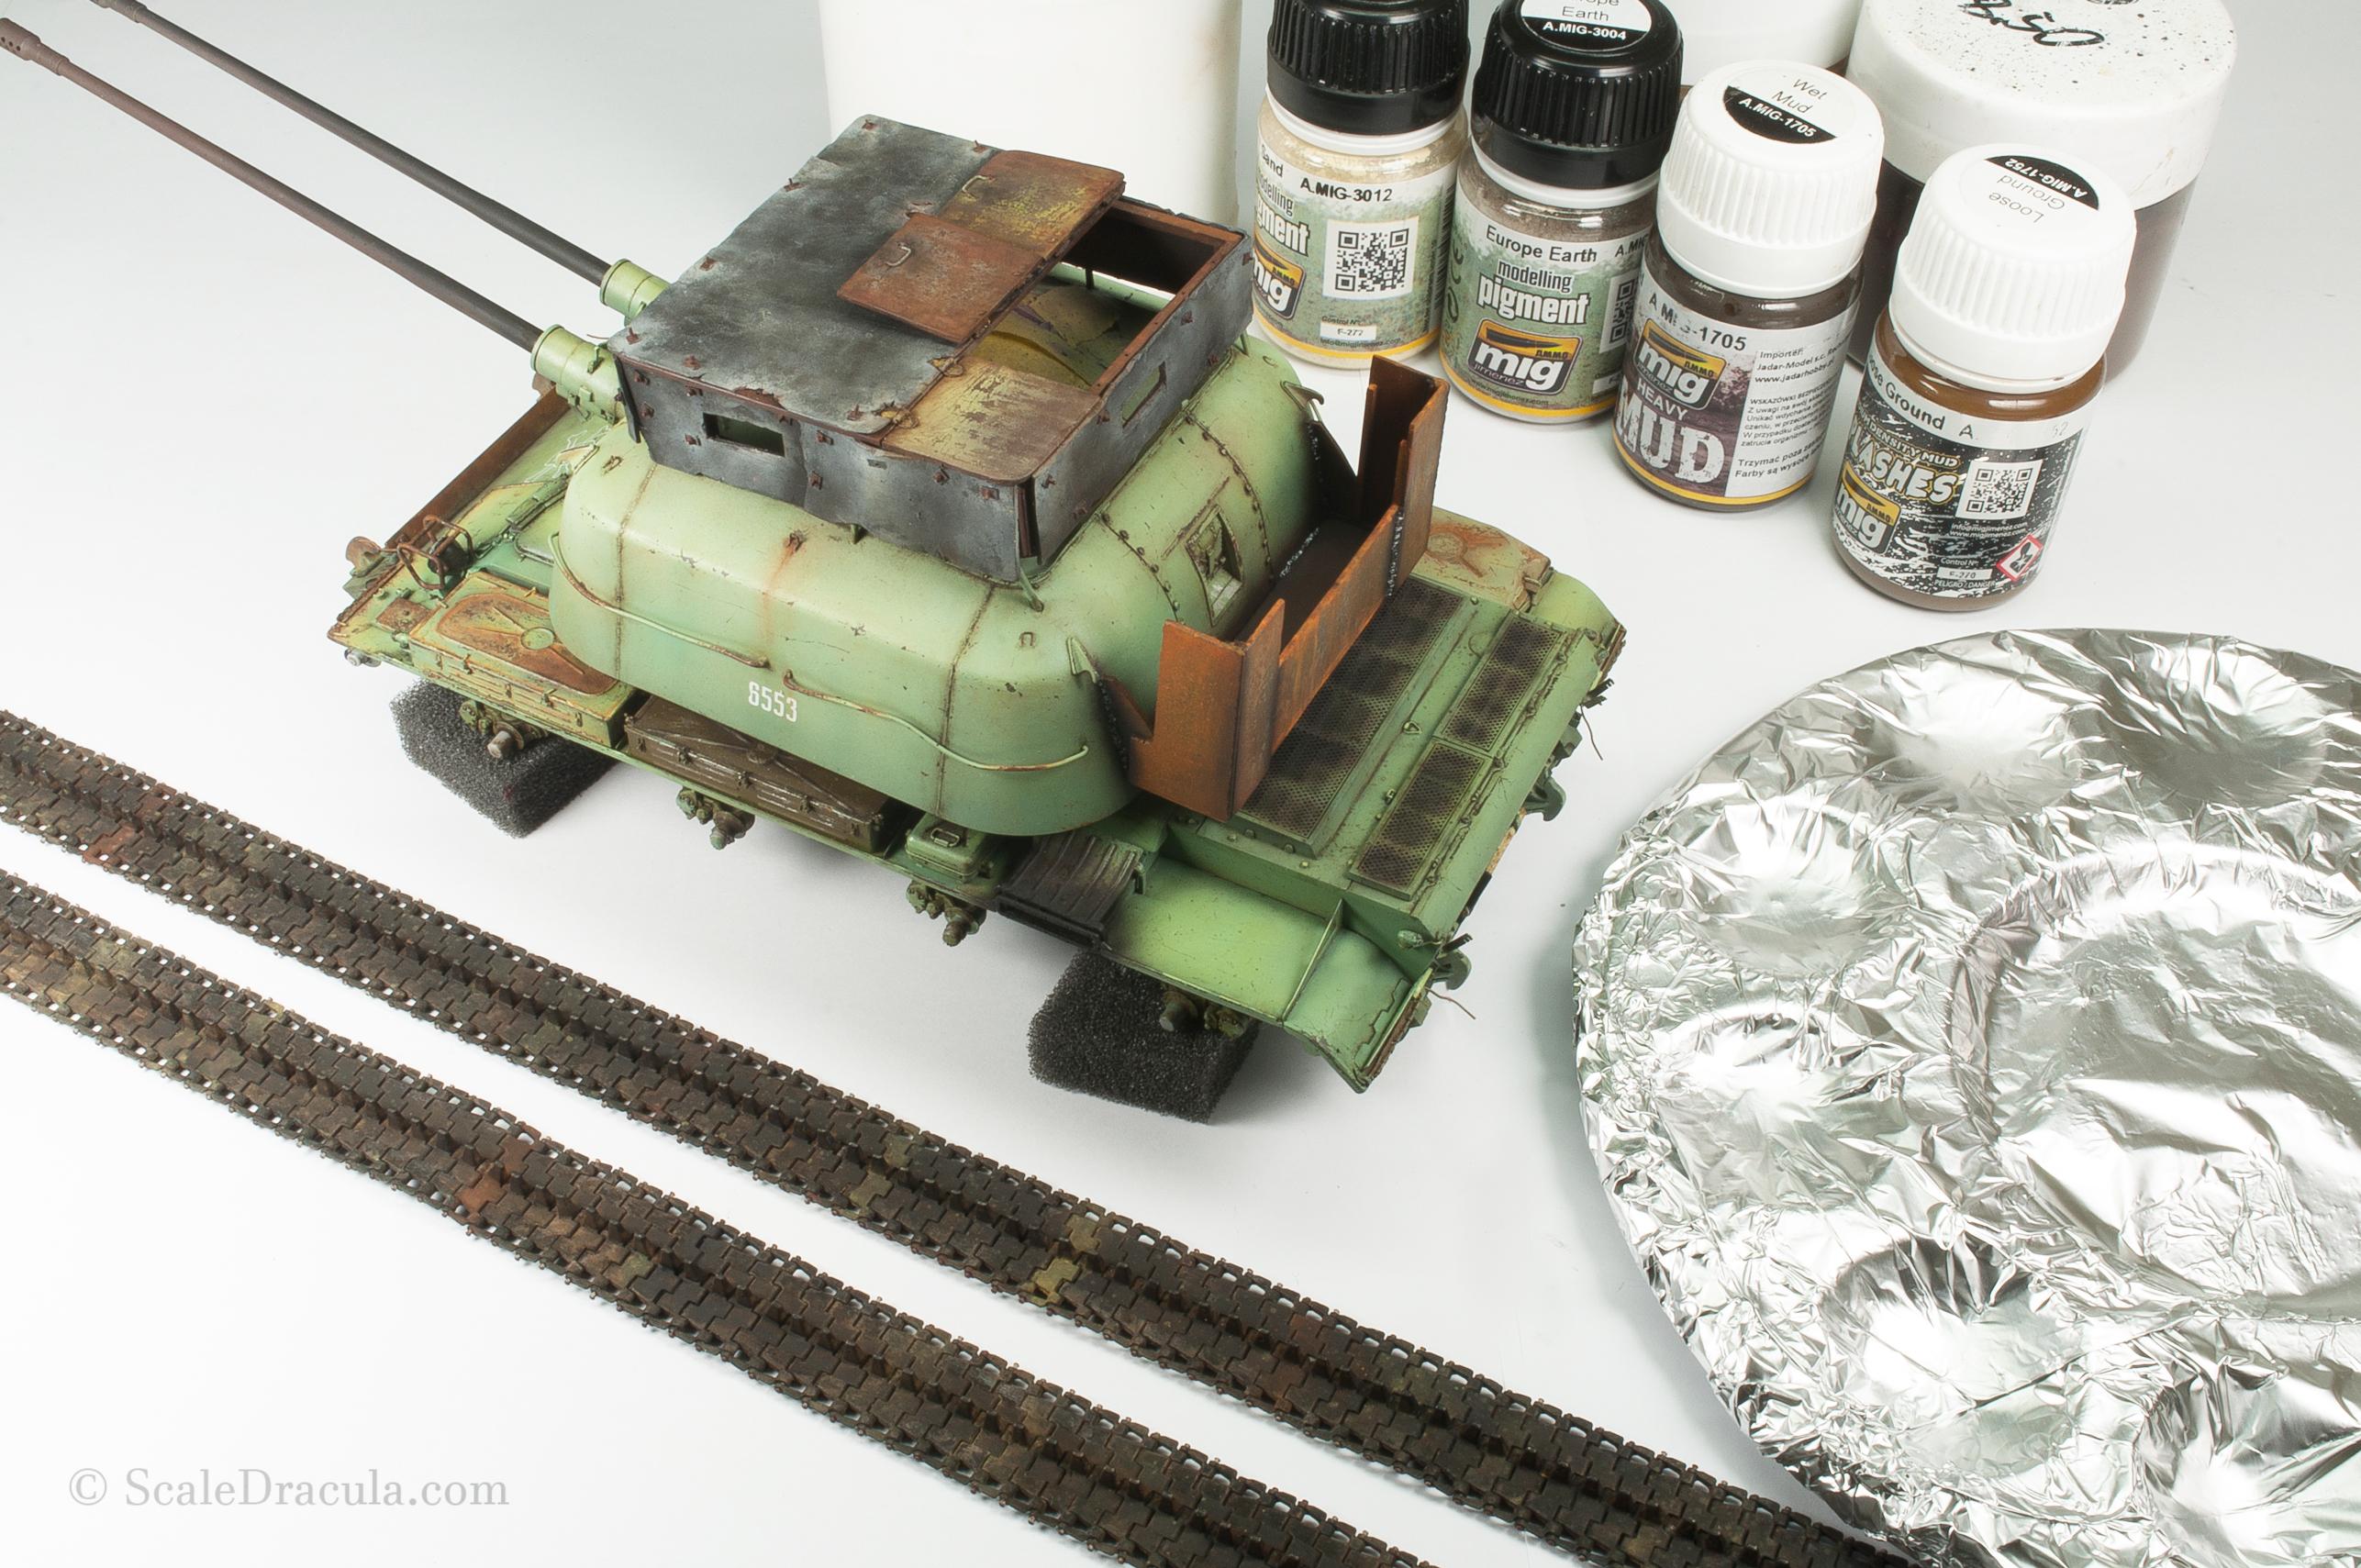 Model is ready to get muddy, ZSU-57 by TAKOM